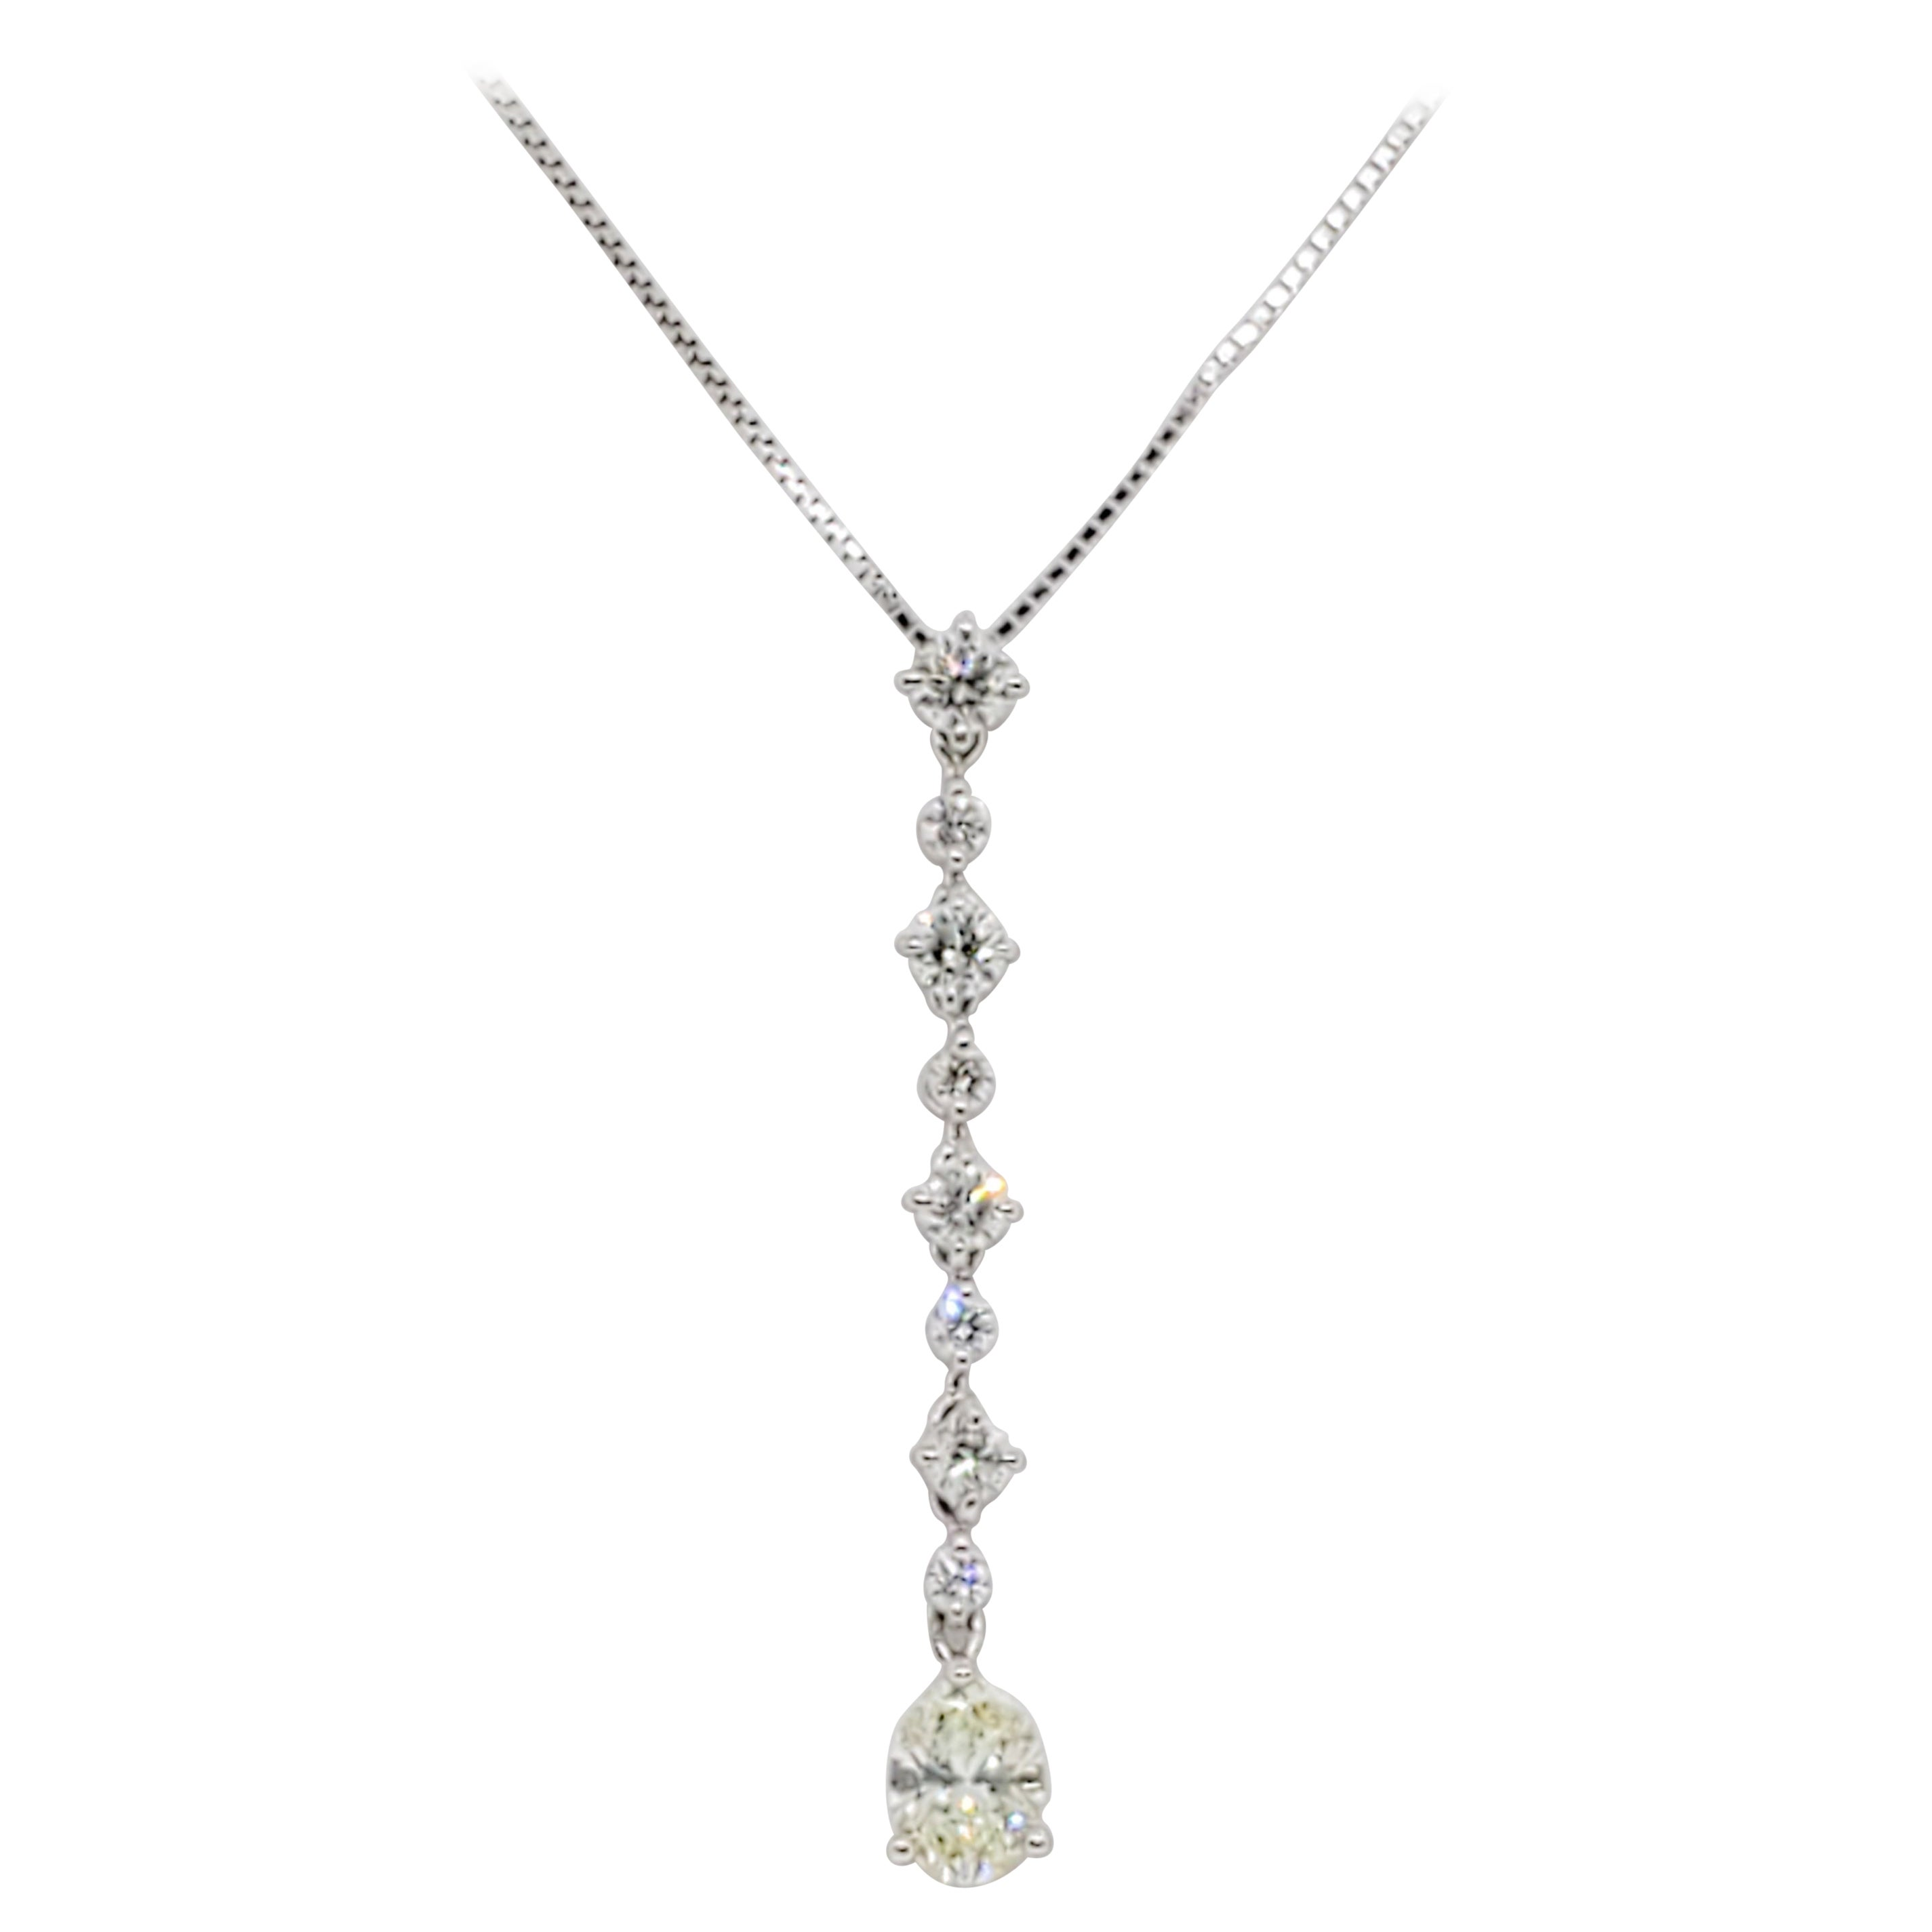 Estate White Diamond Oval Pendant Necklace in Platinum